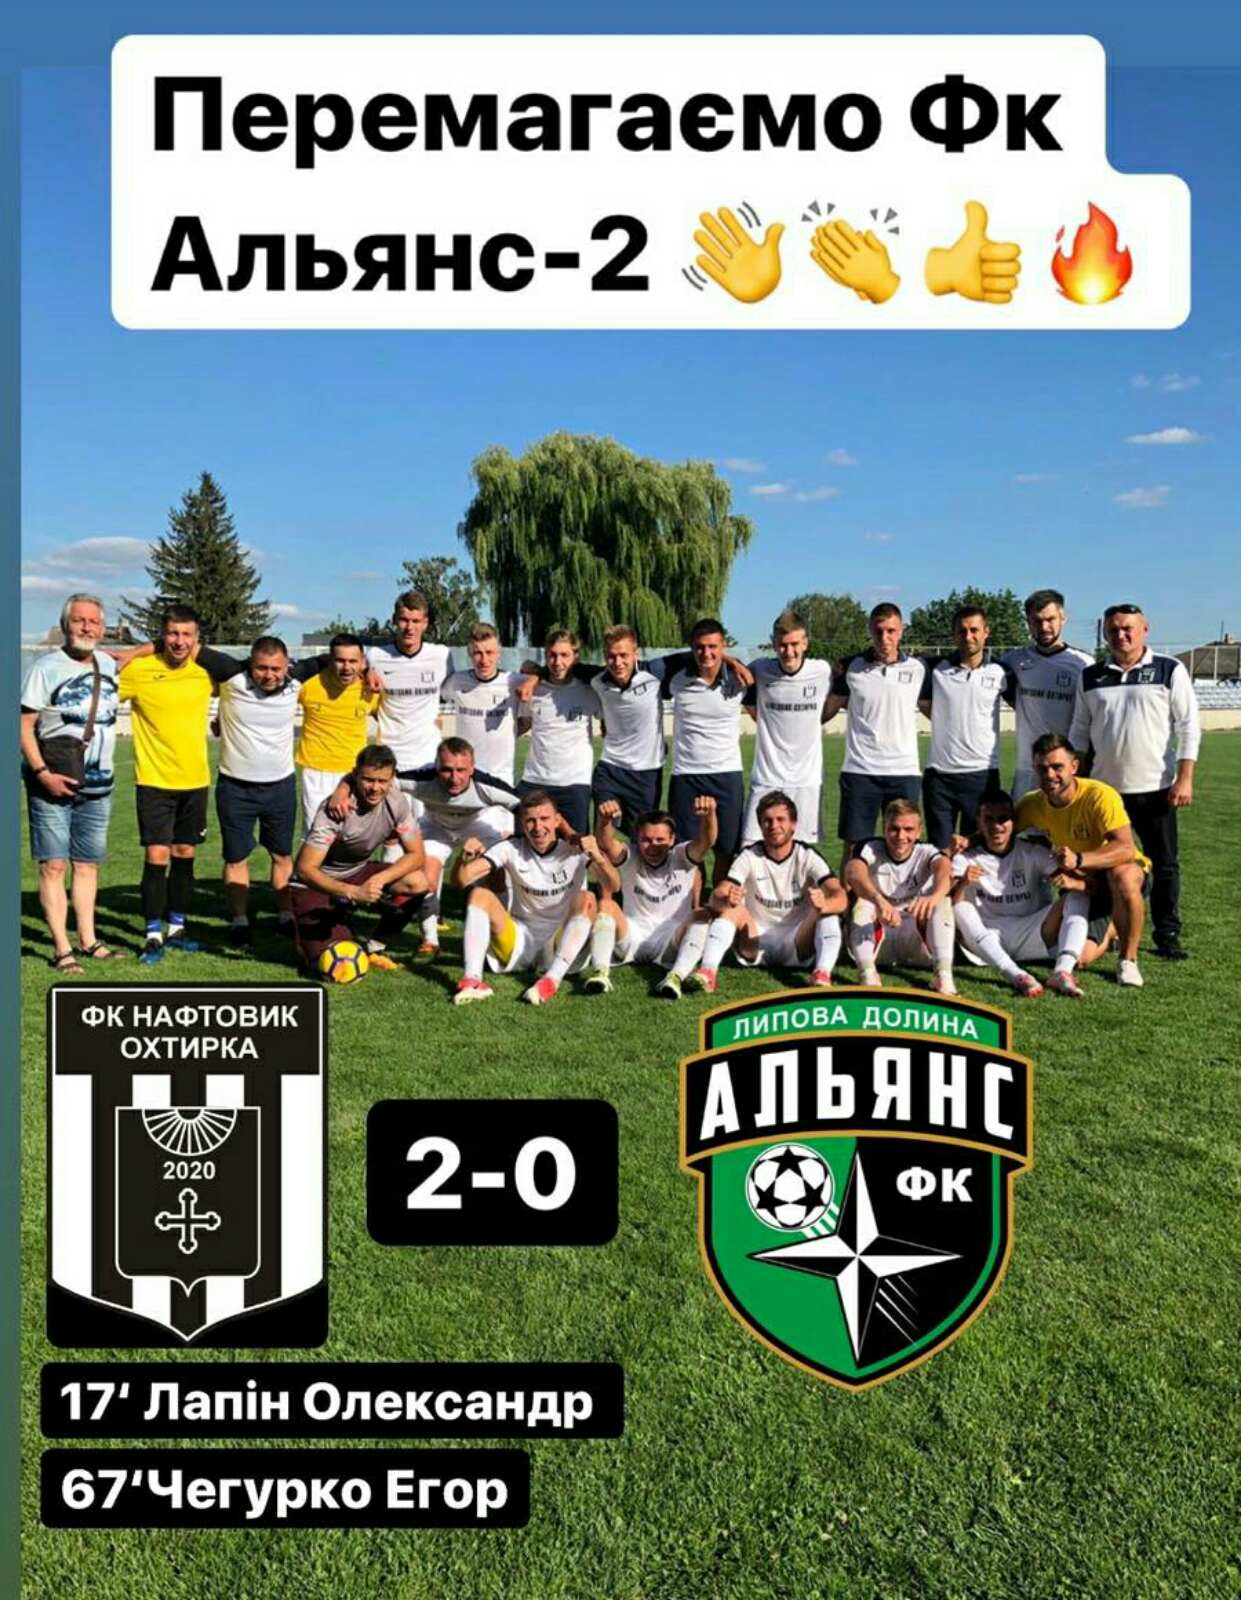 ФК «Нафтовик–Охтирка» вдома перемогла команду ФК «Альянс-2»